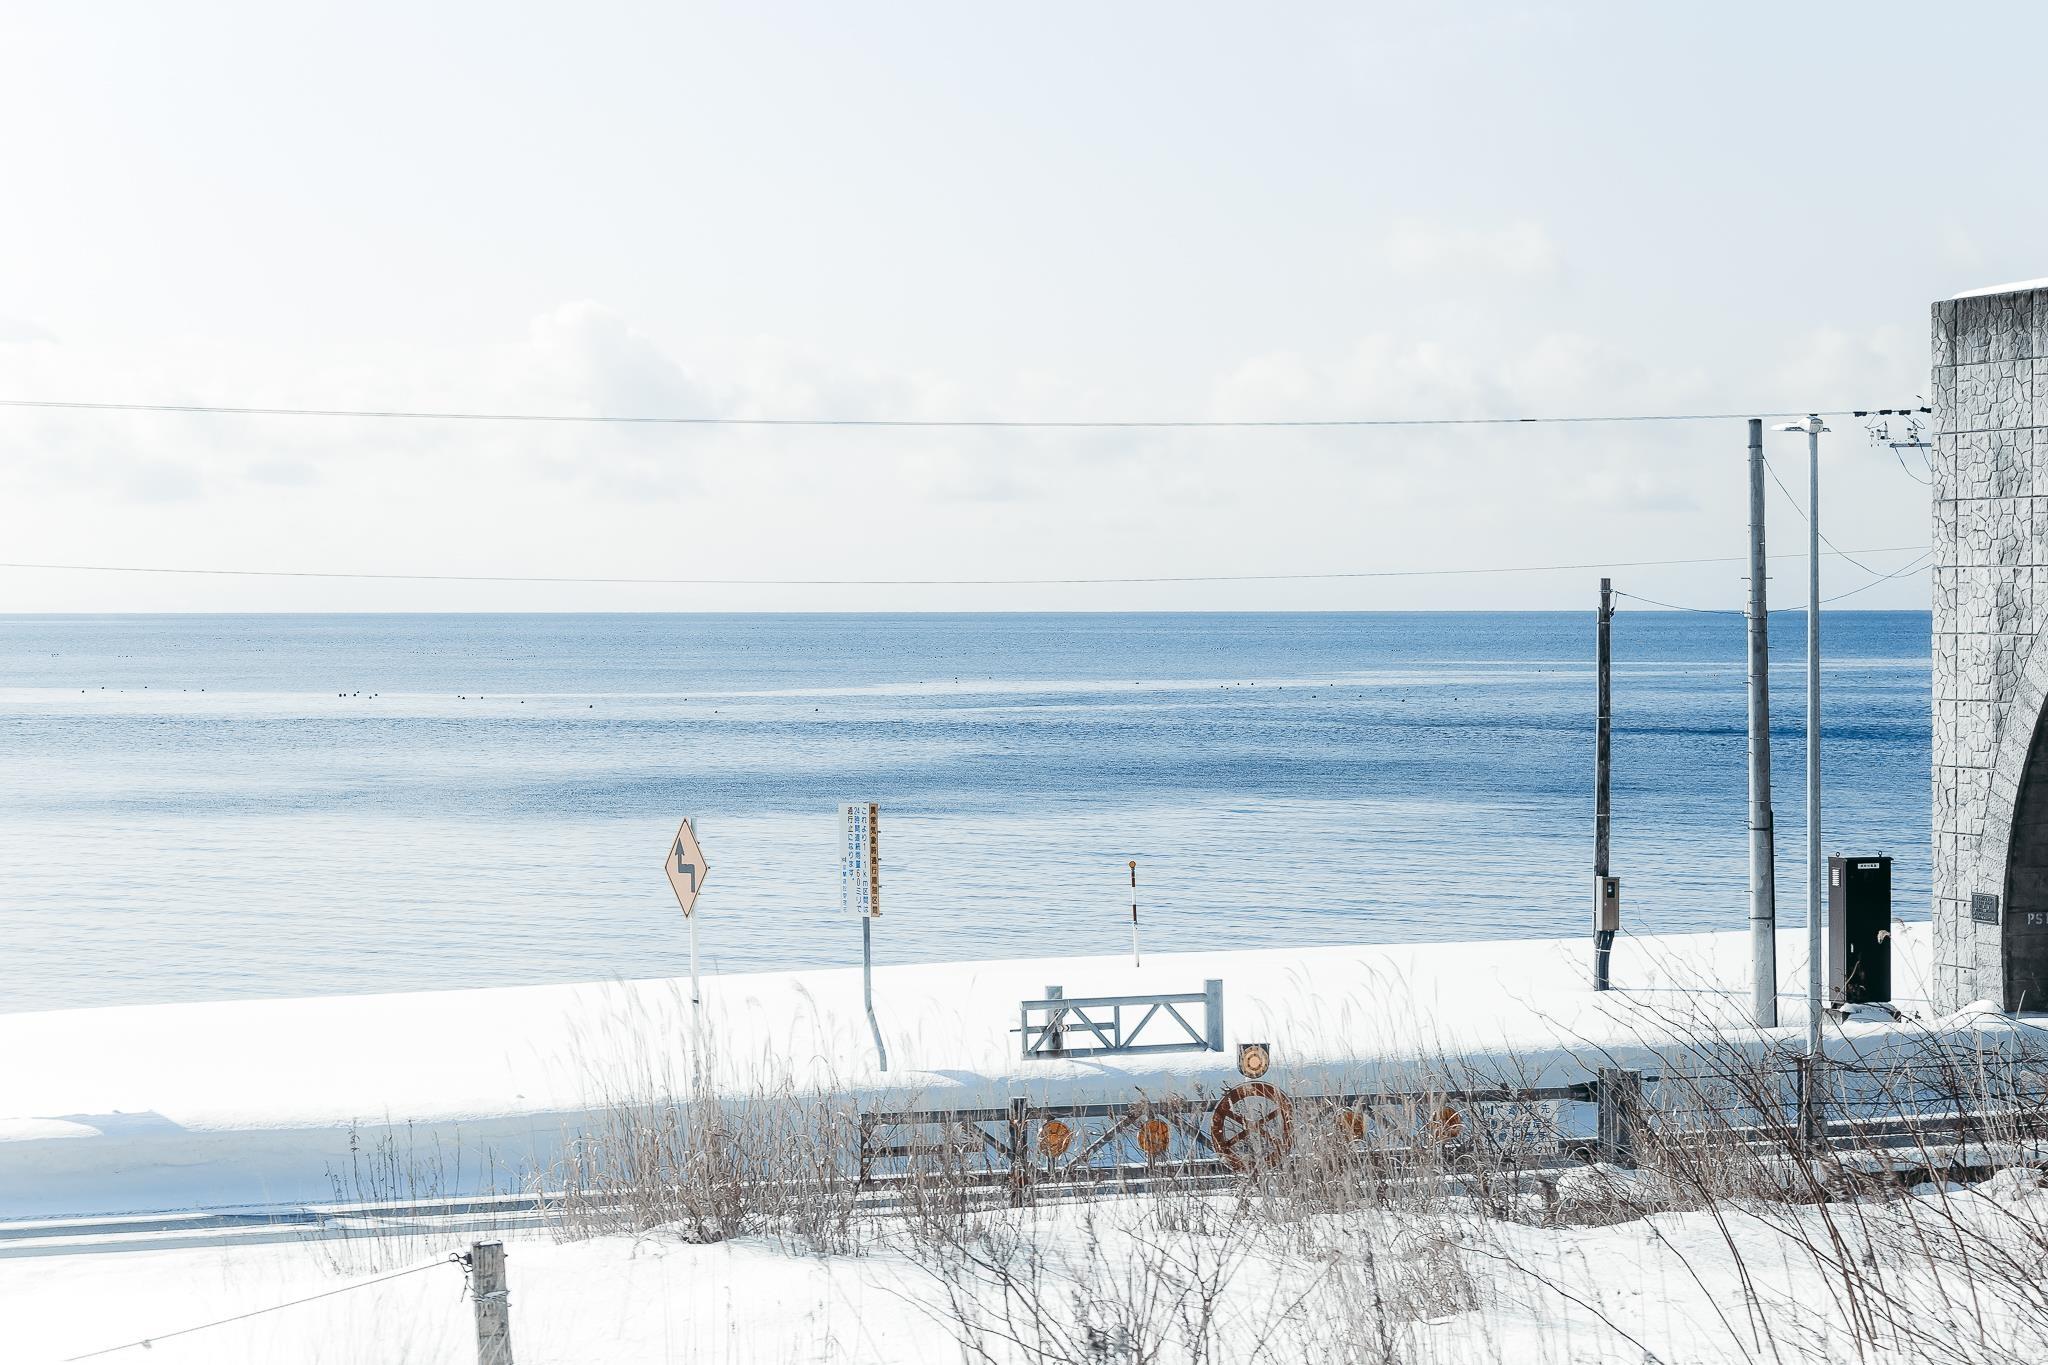 Hokkaido tuyet trang, noi dang den nhat mua dong o Nhat Ban hinh anh 15